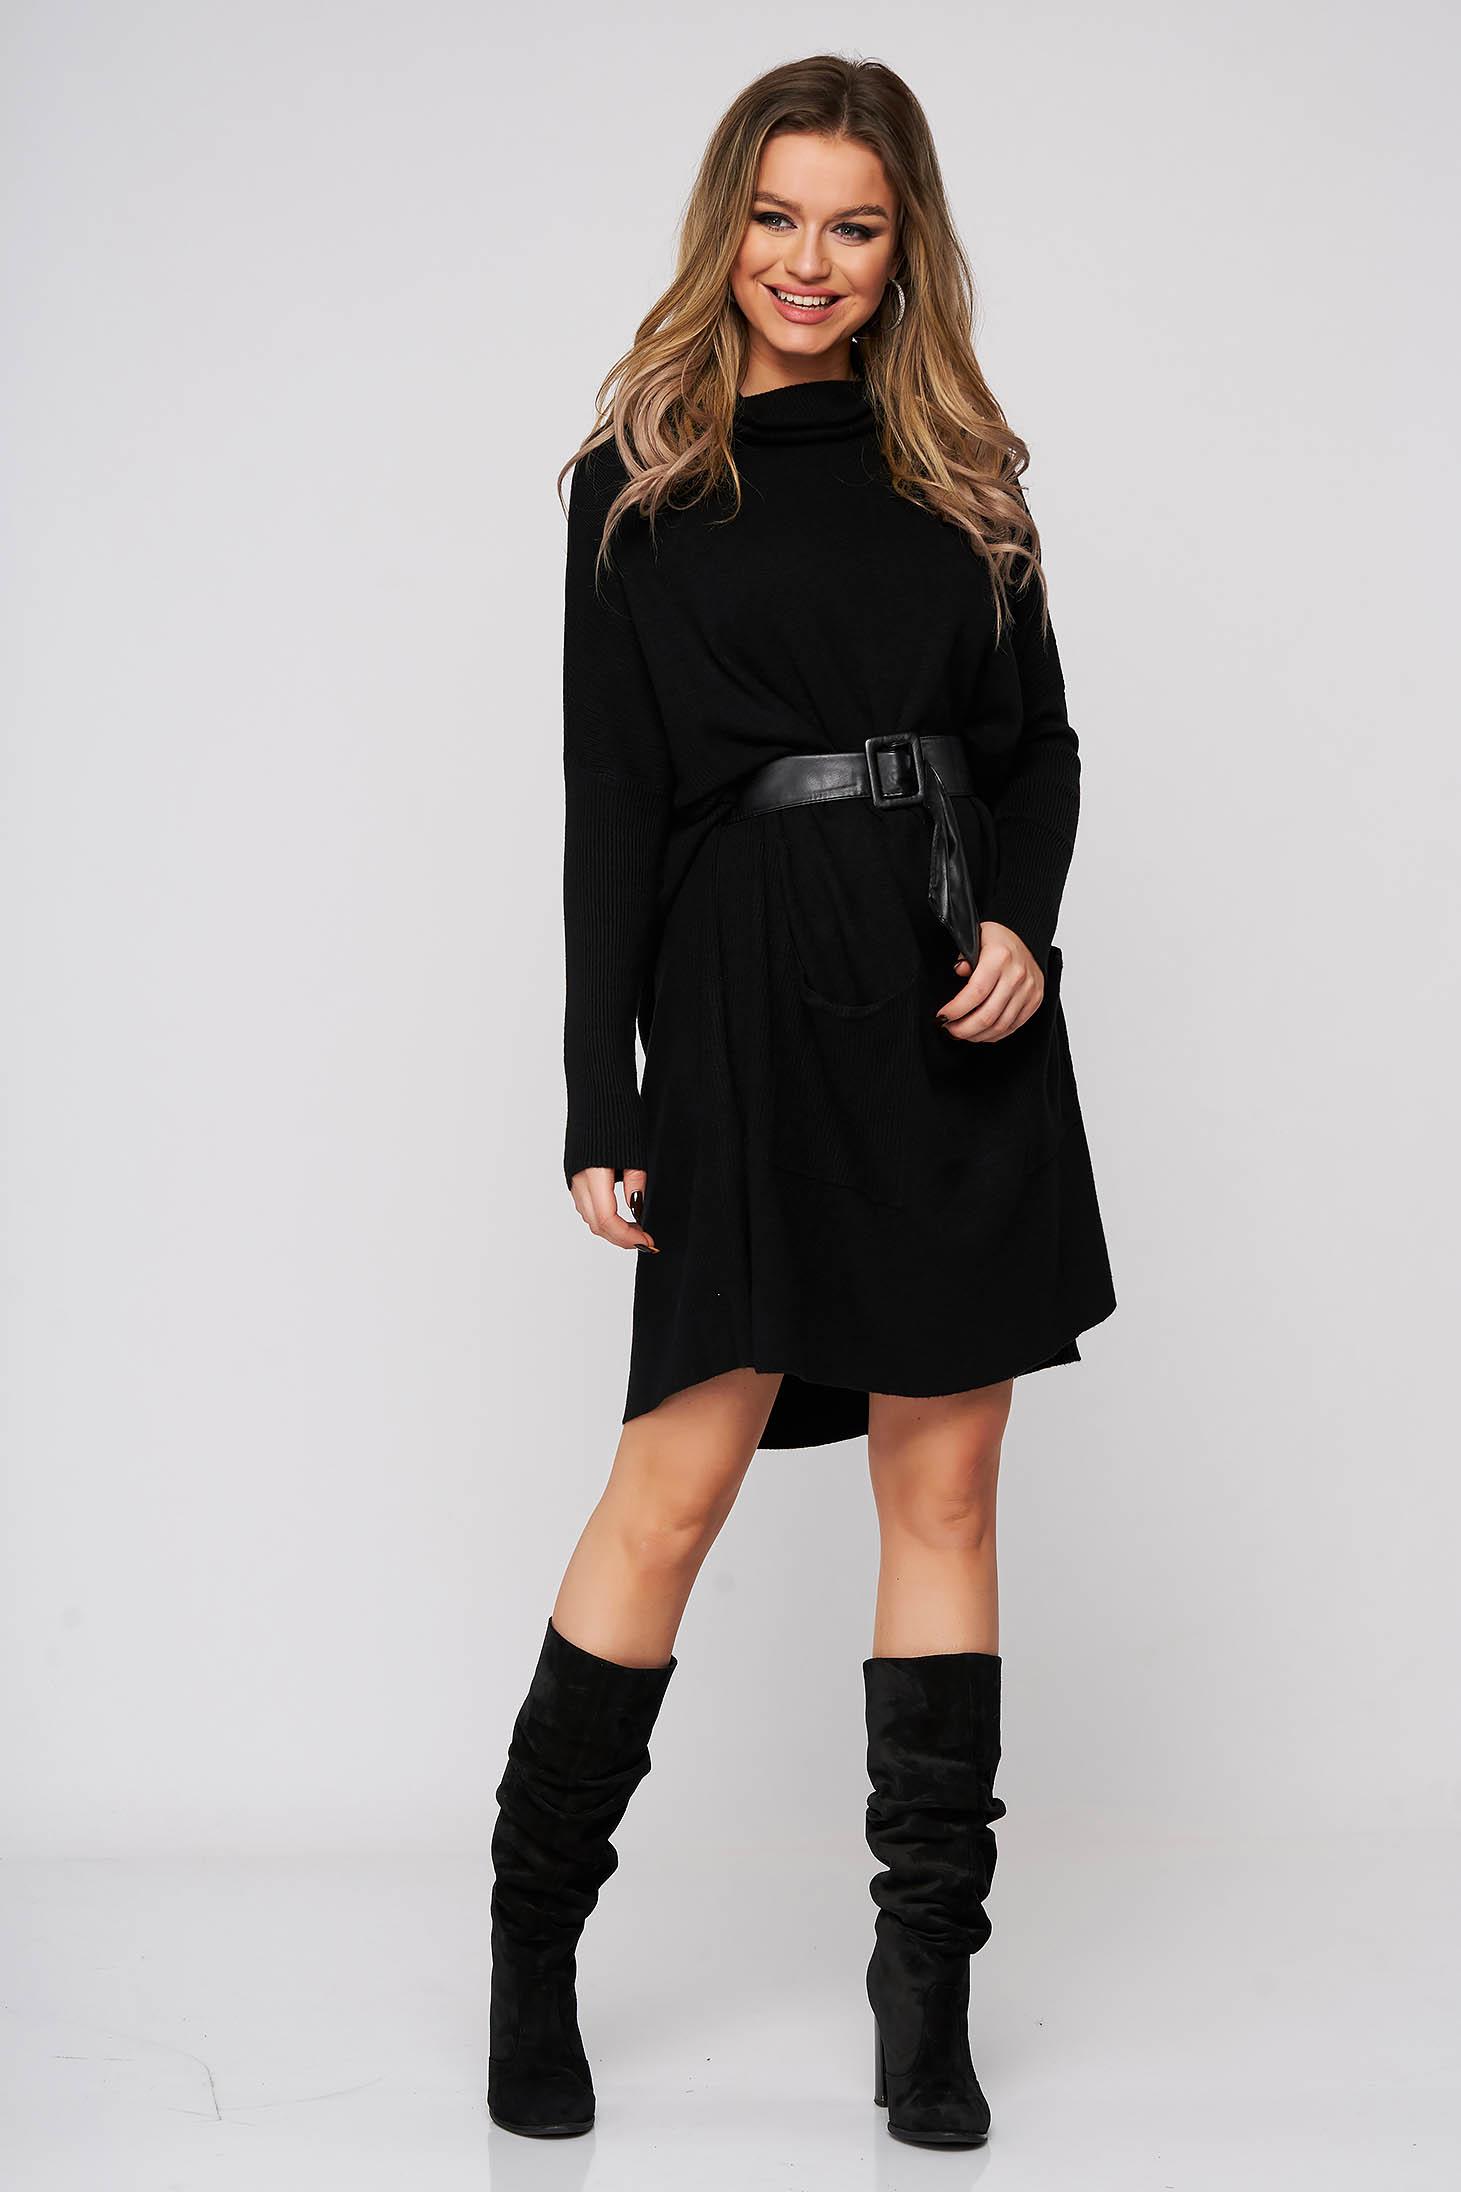 Rochie SunShine neagra din material elastic cu croi larg cu buzunare si accesoriu tip curea